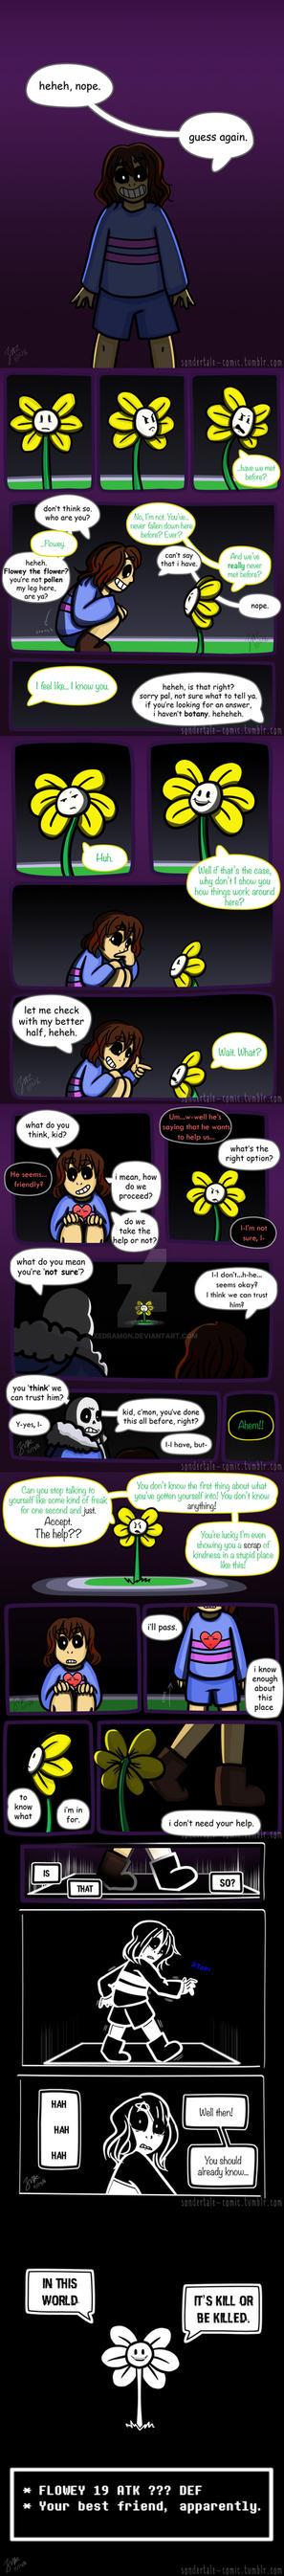 Sondertale: Chapter 1: Part 6 by Xedramon